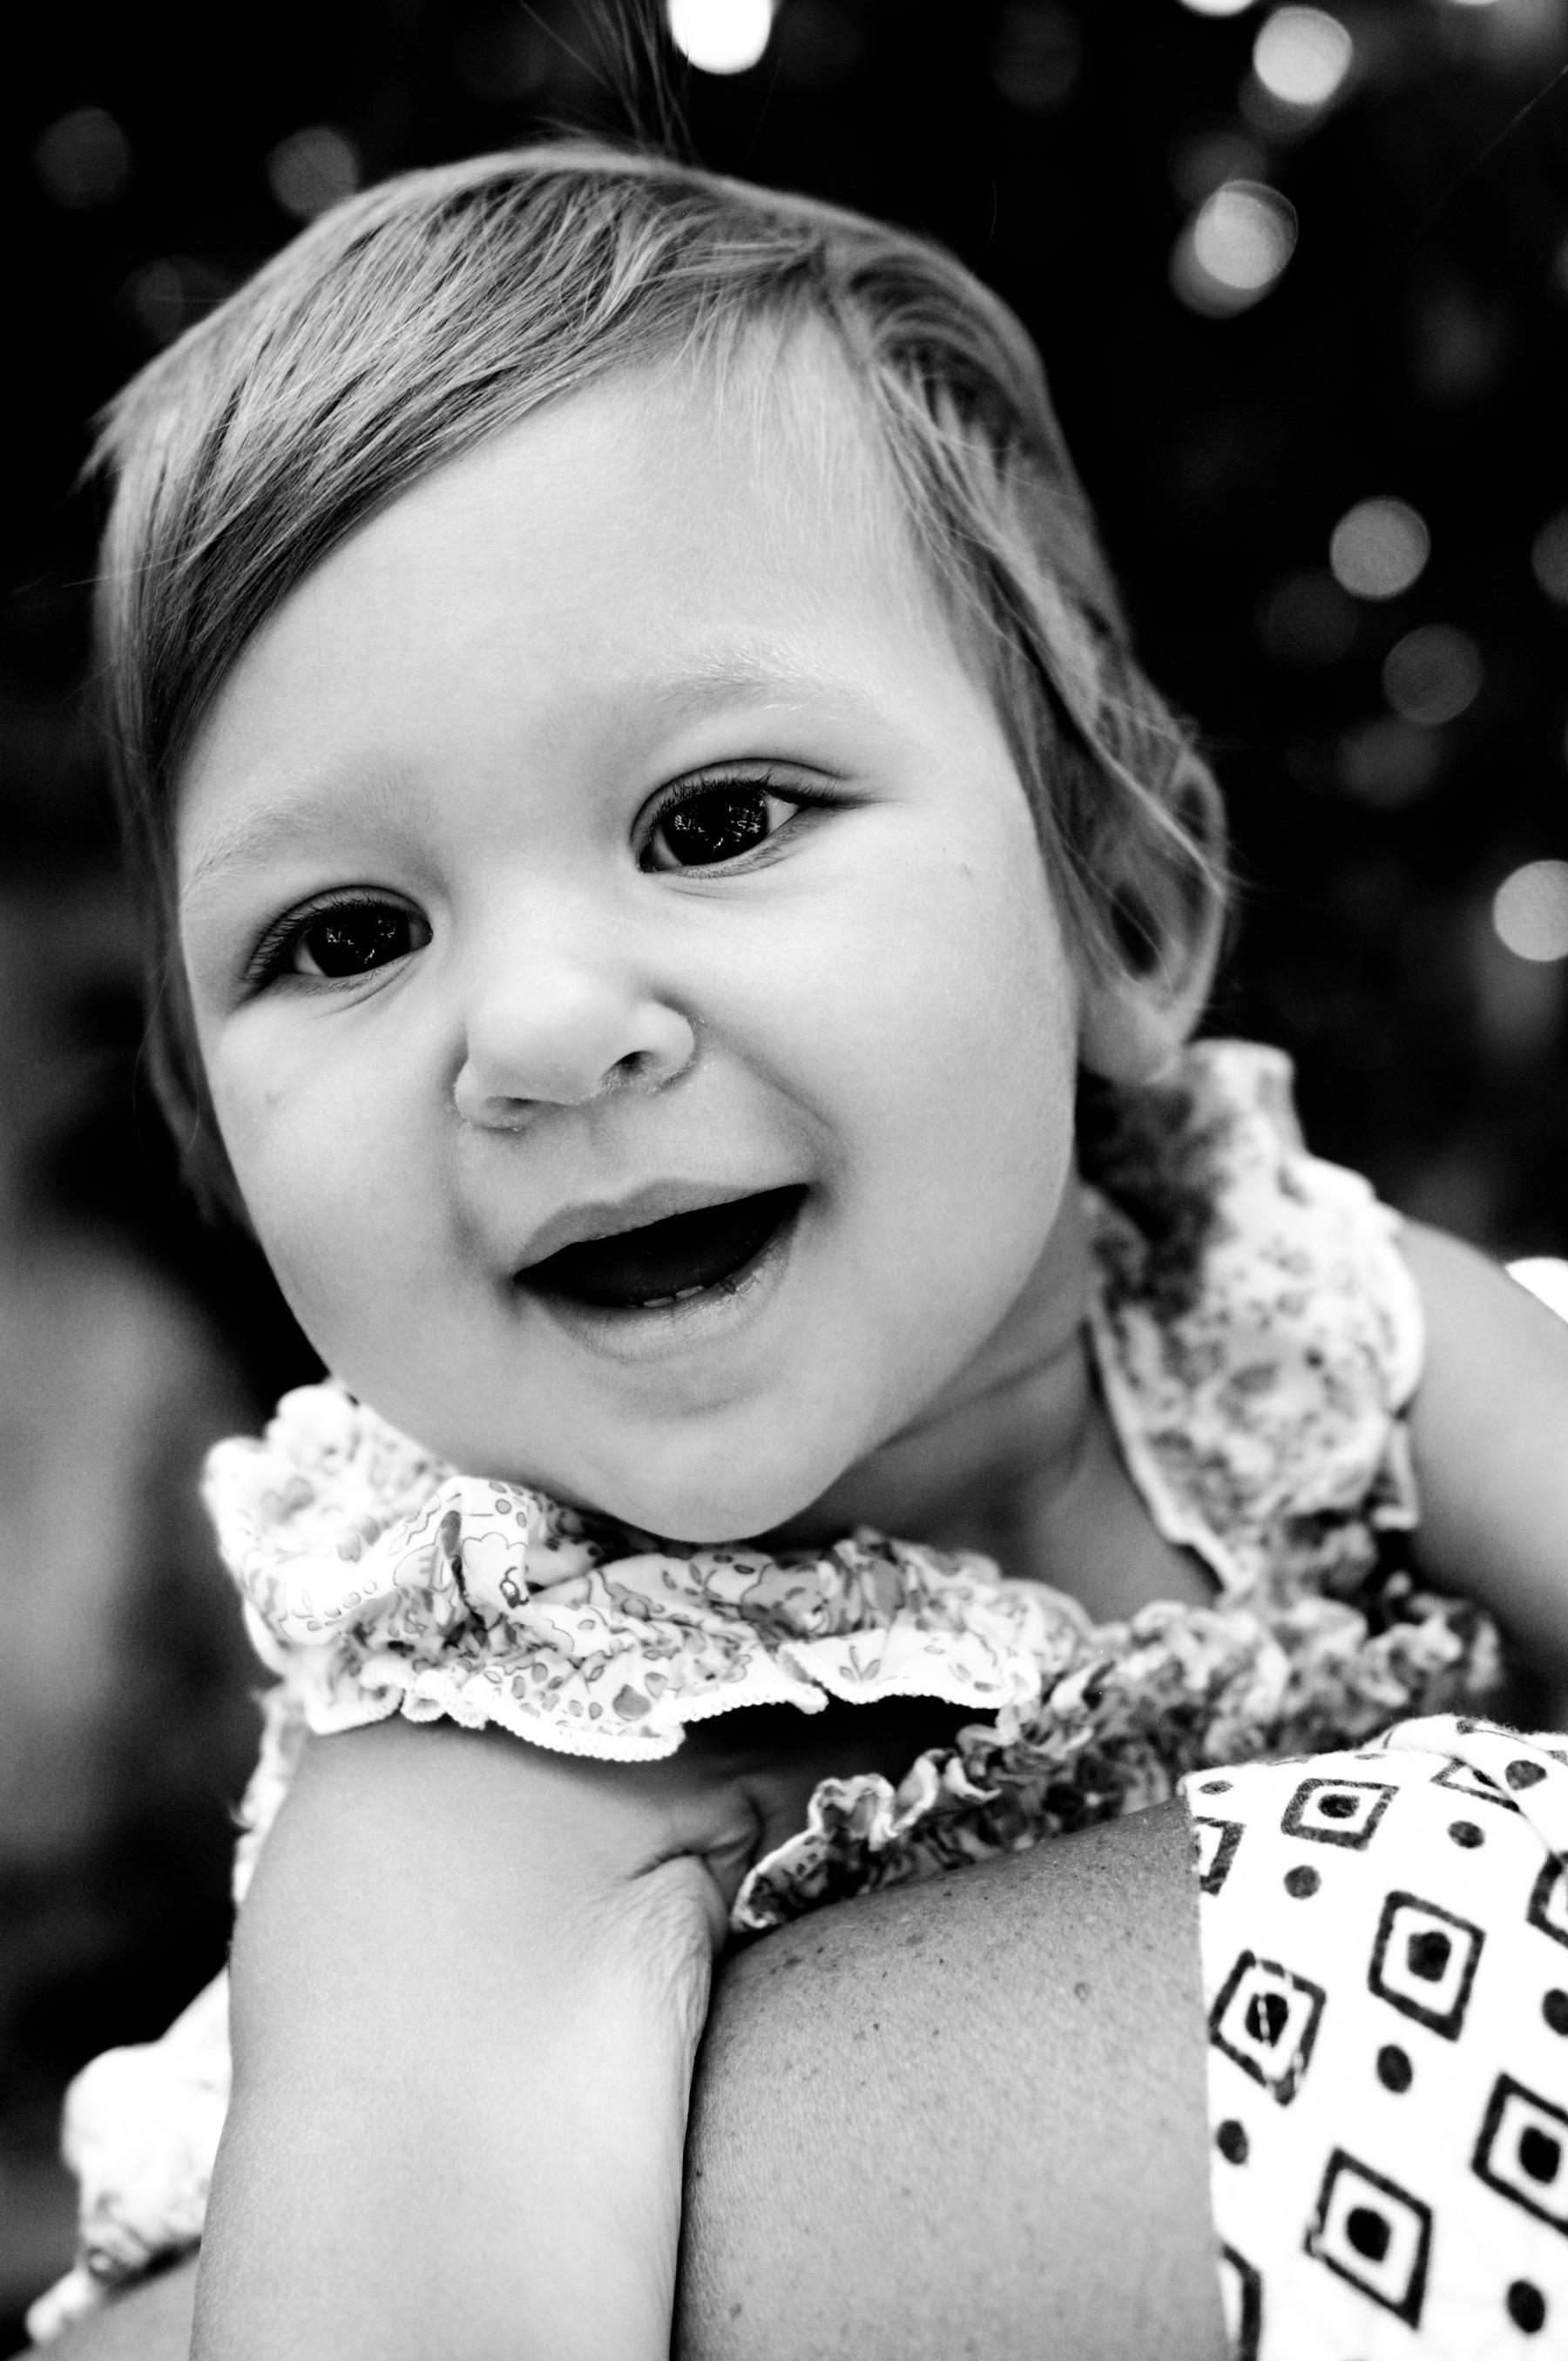 petaluma_baby_photographer_marin_baby_photographer_sonoma_baby_portraiture_026